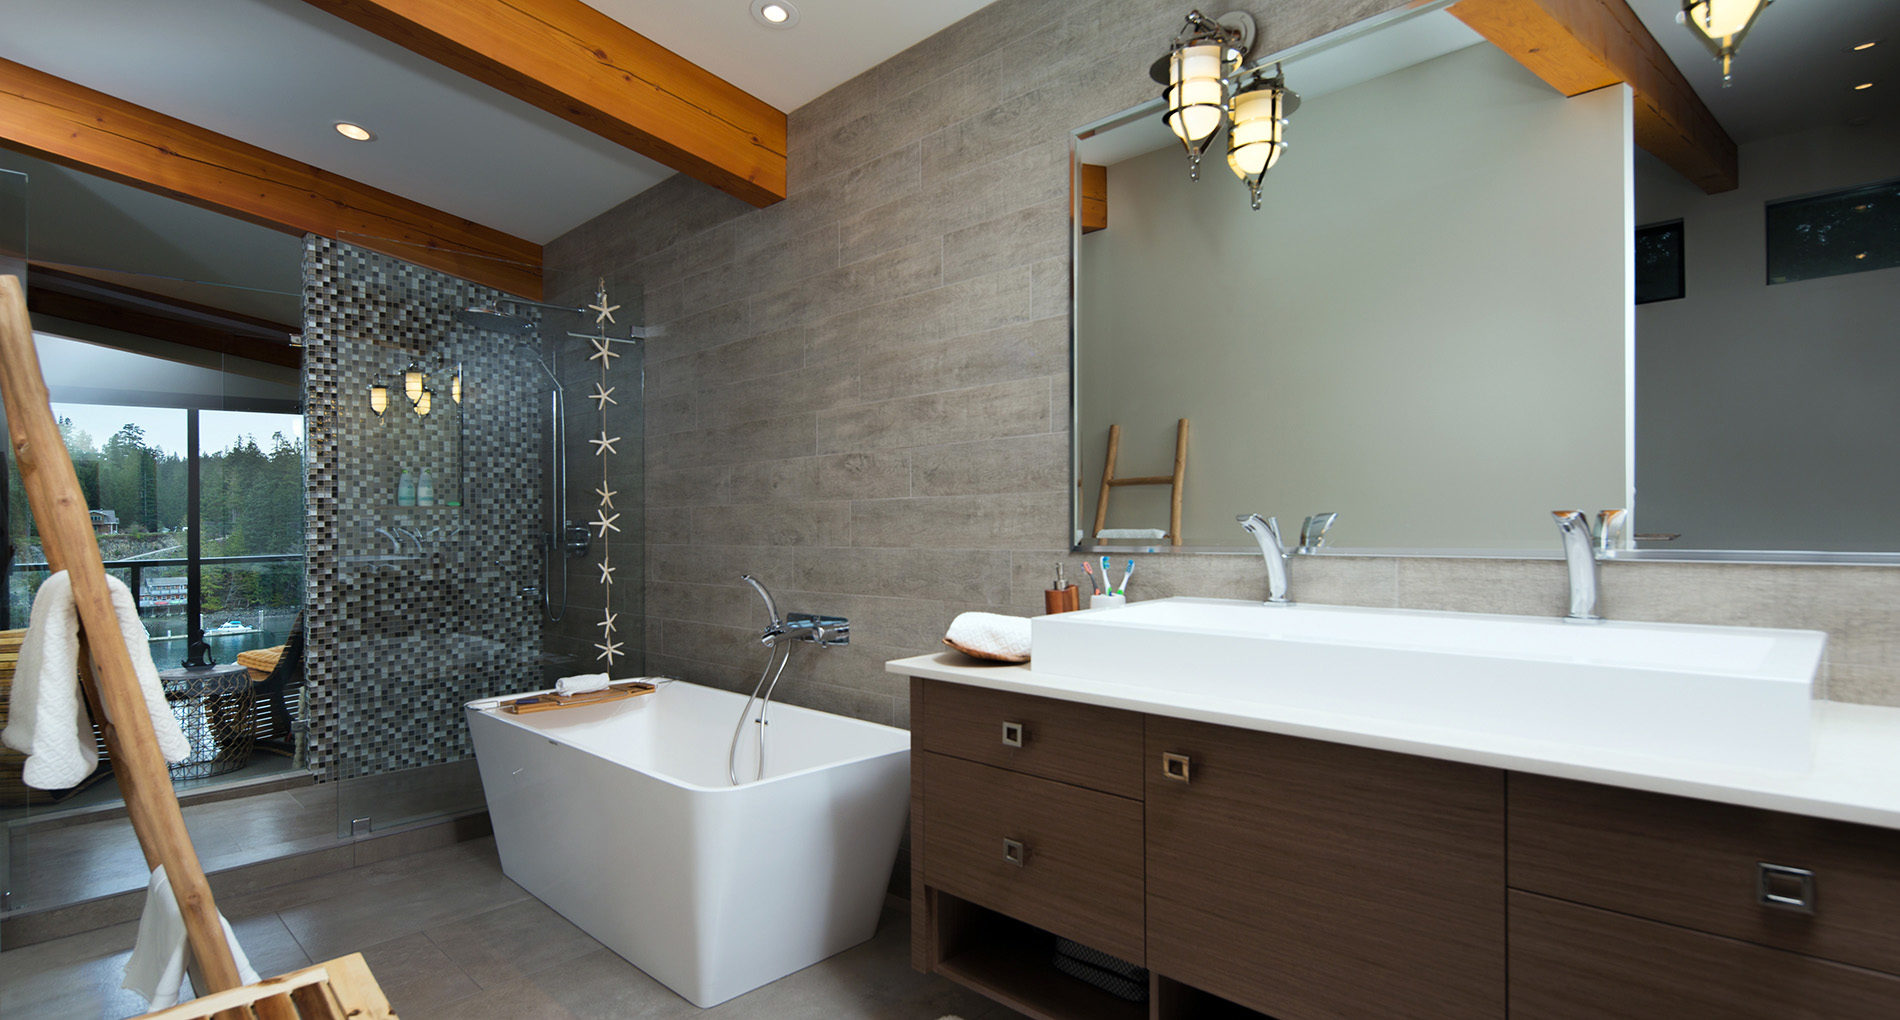 Bathroom Renovation Springwater Cliffcustom Slider